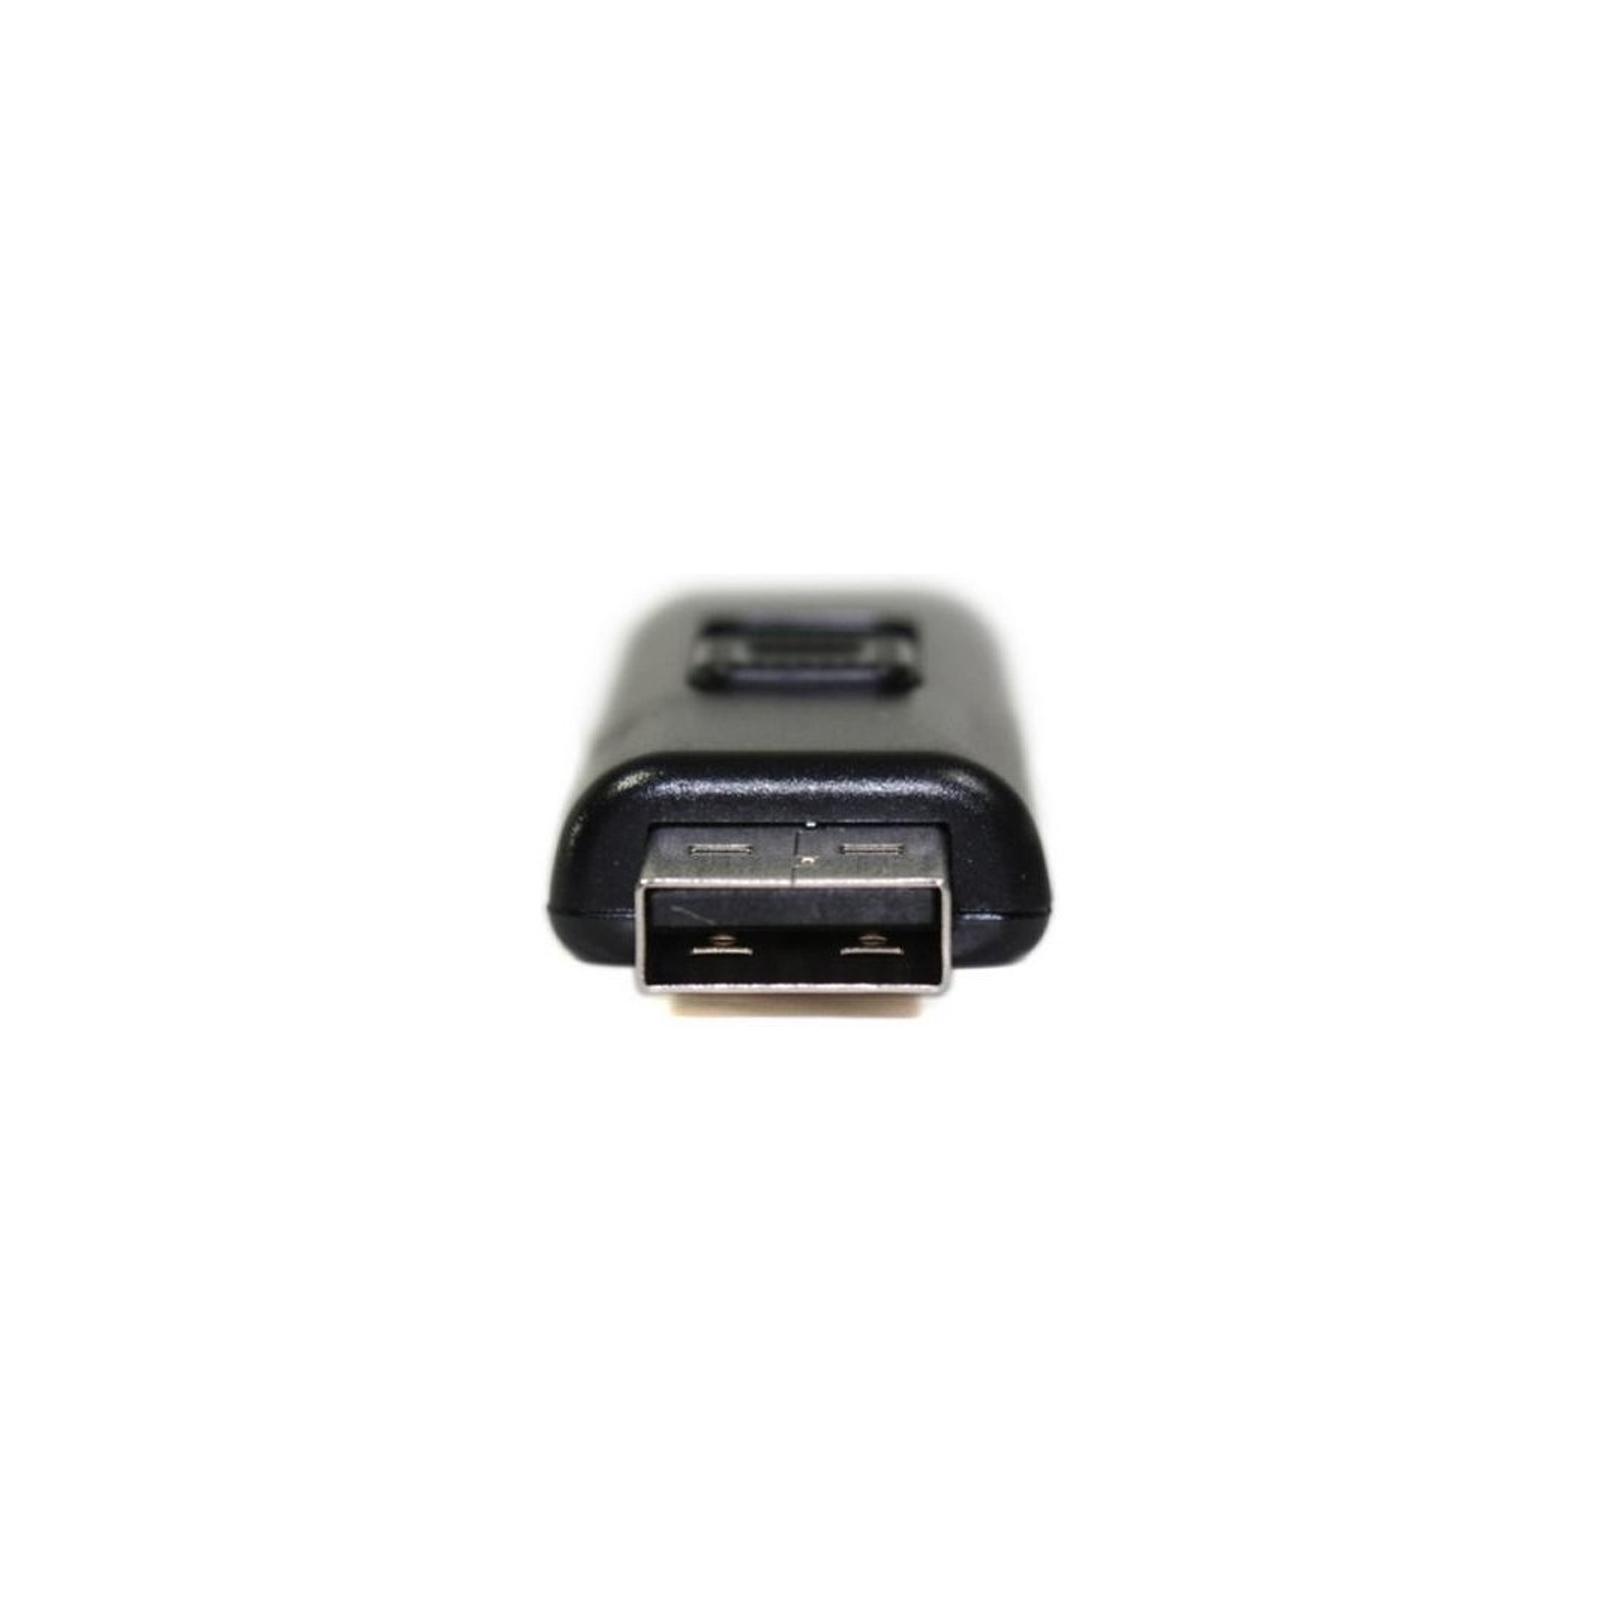 USB флеш накопитель Handy Steno AH325 black Apacer (AP8GAH325B-1) изображение 4